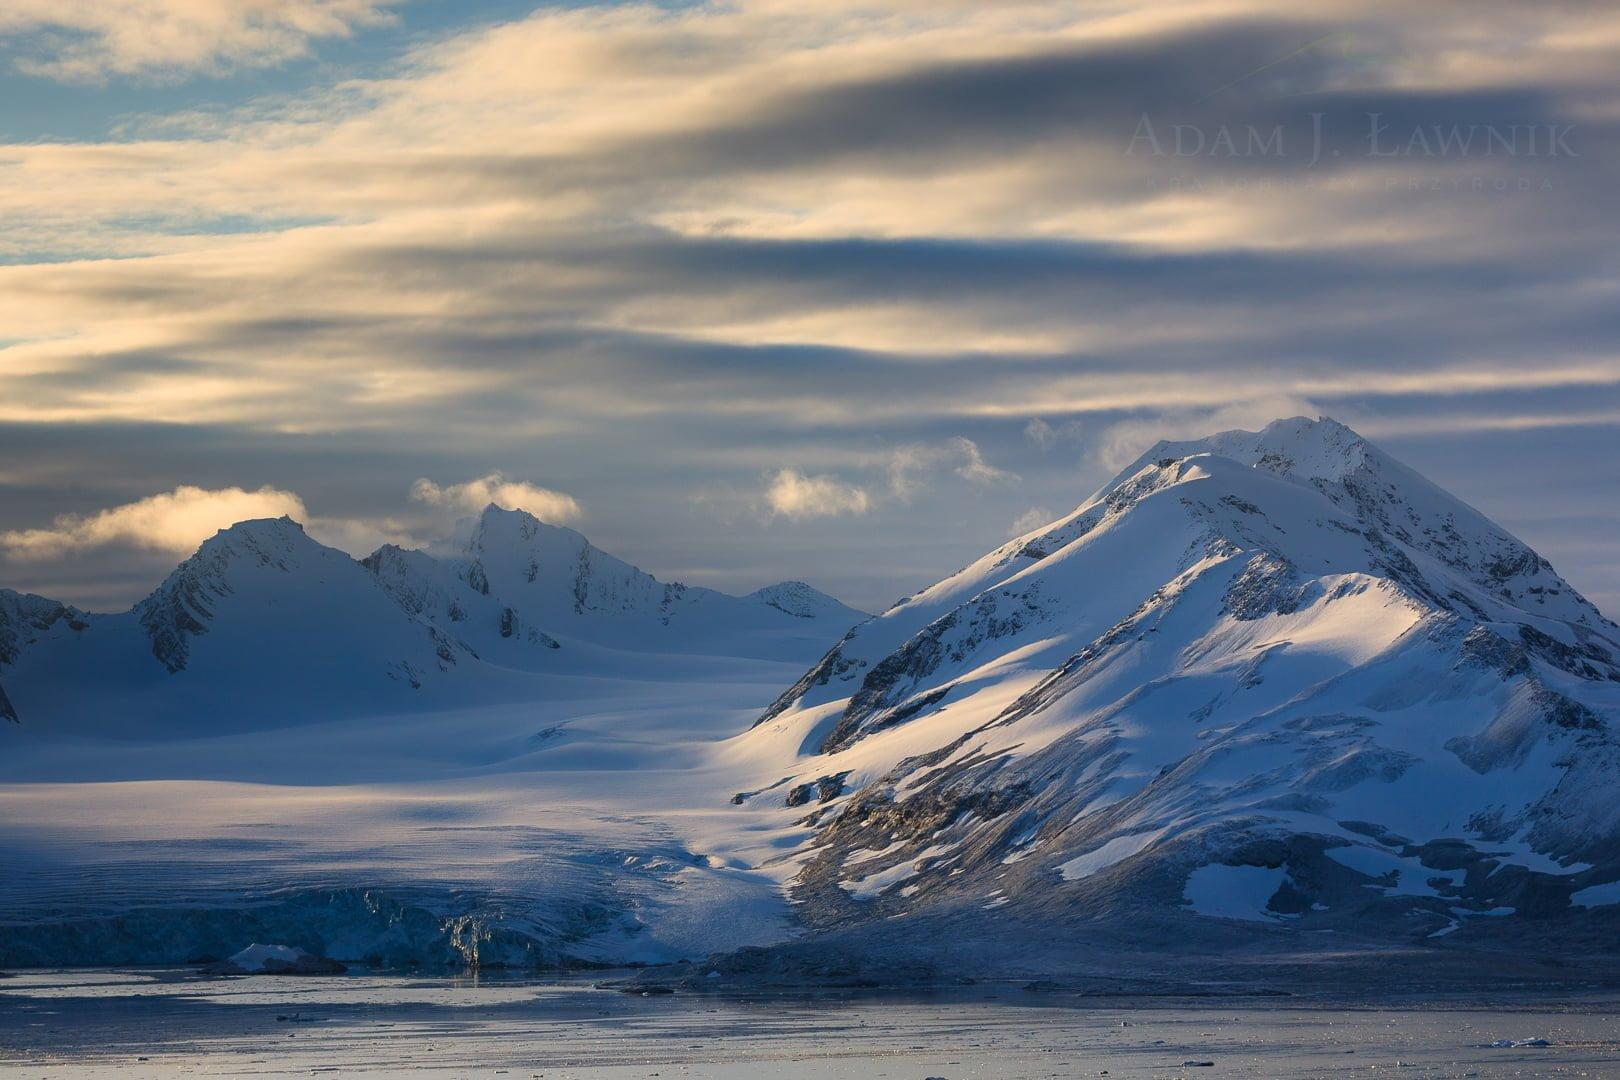 Widok z Przylądka Treskelen - Spitsbergen